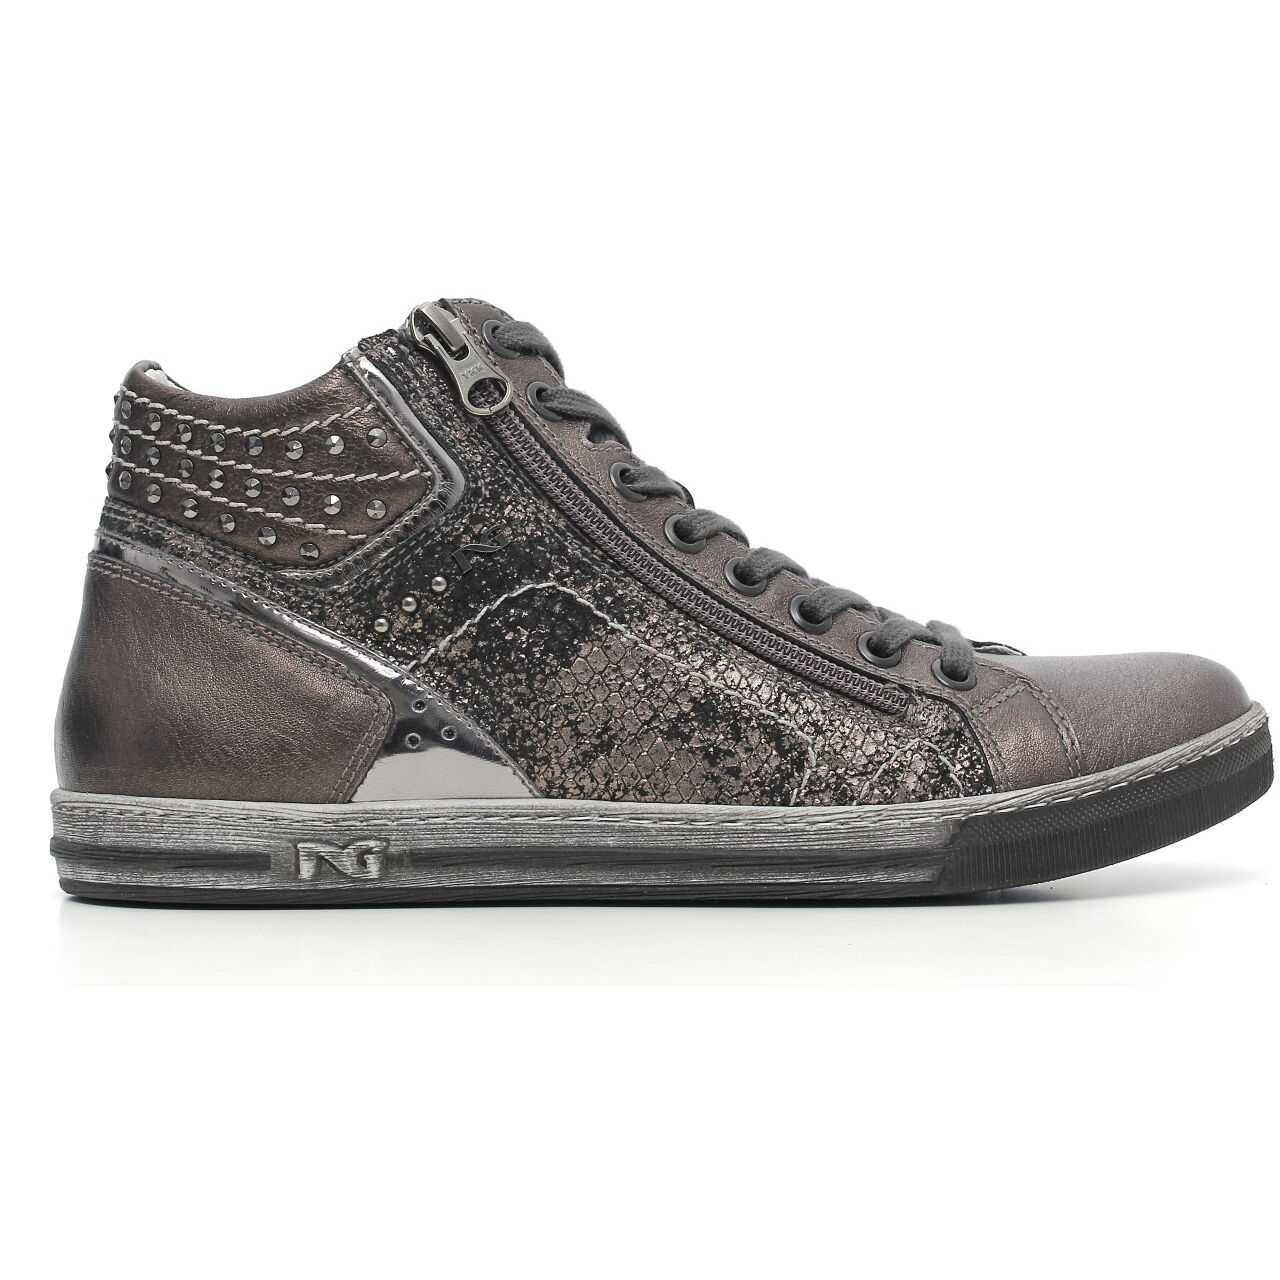 Chaussures de sport femme Nerogiardini automne A616040D collection automne Nerogiardini hiver 0ee495